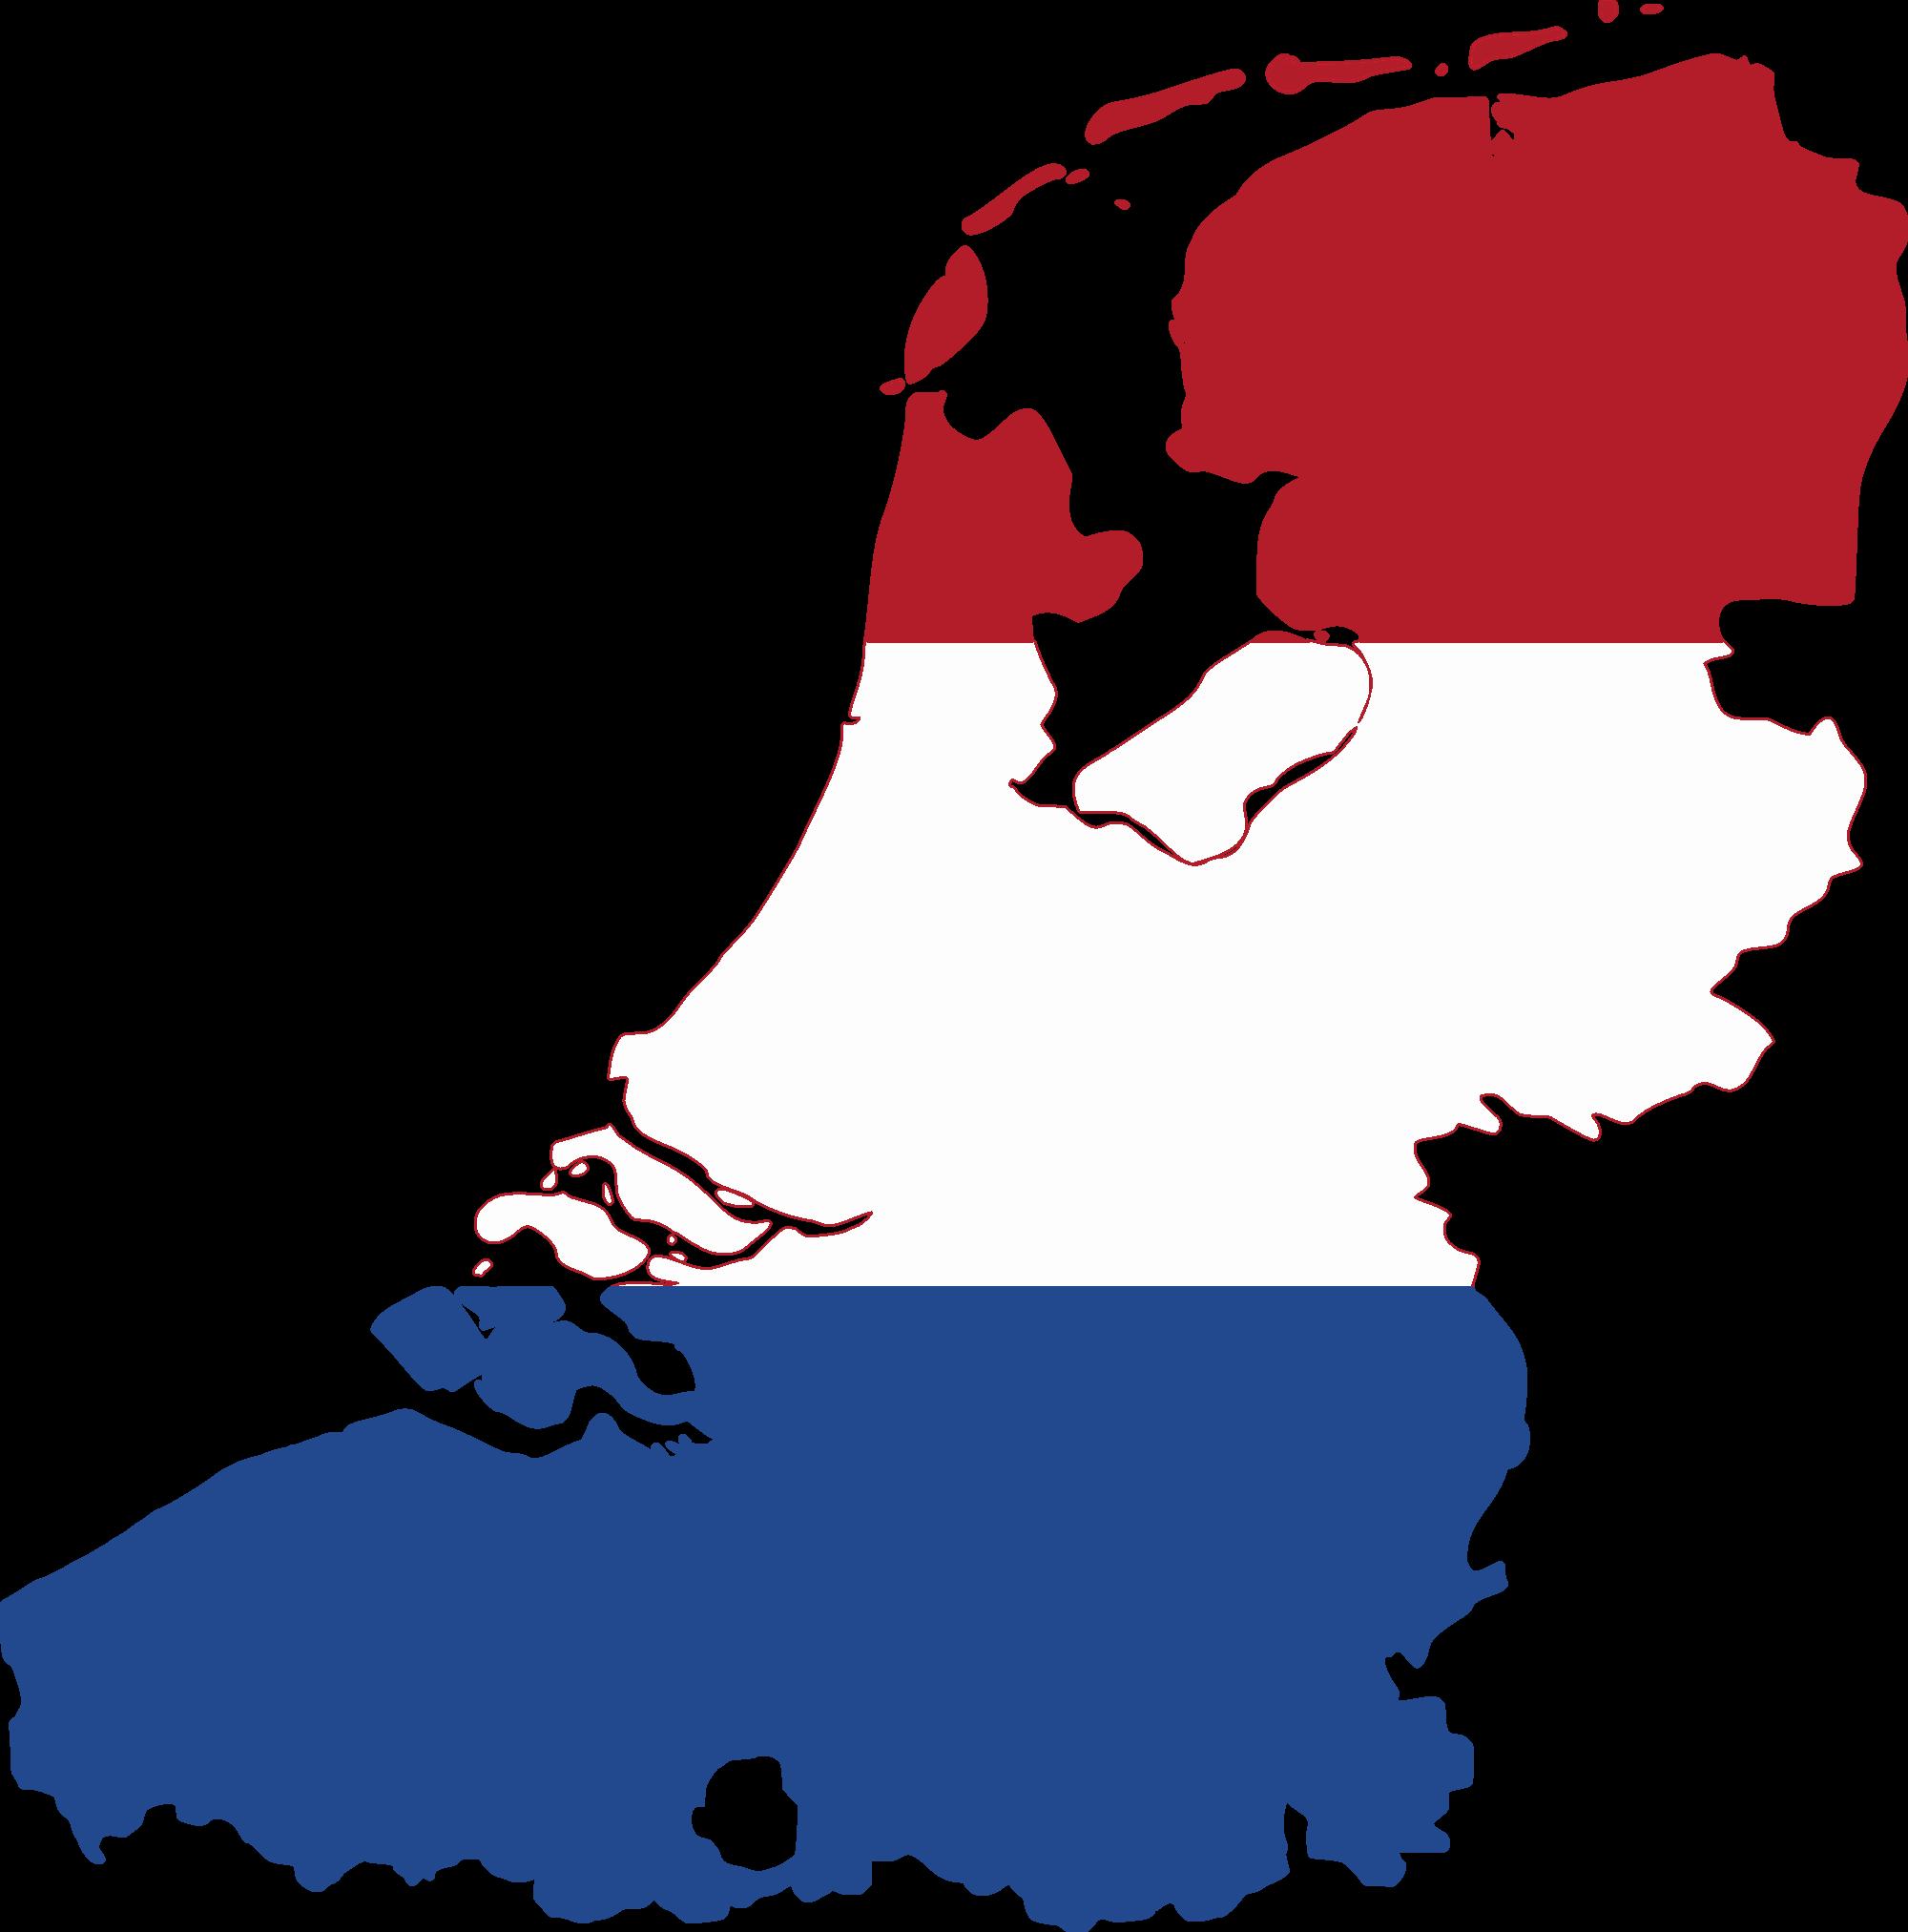 Fileflag map of the dutch languageg wikimedia commons fileflag map of the dutch languageg gumiabroncs Choice Image